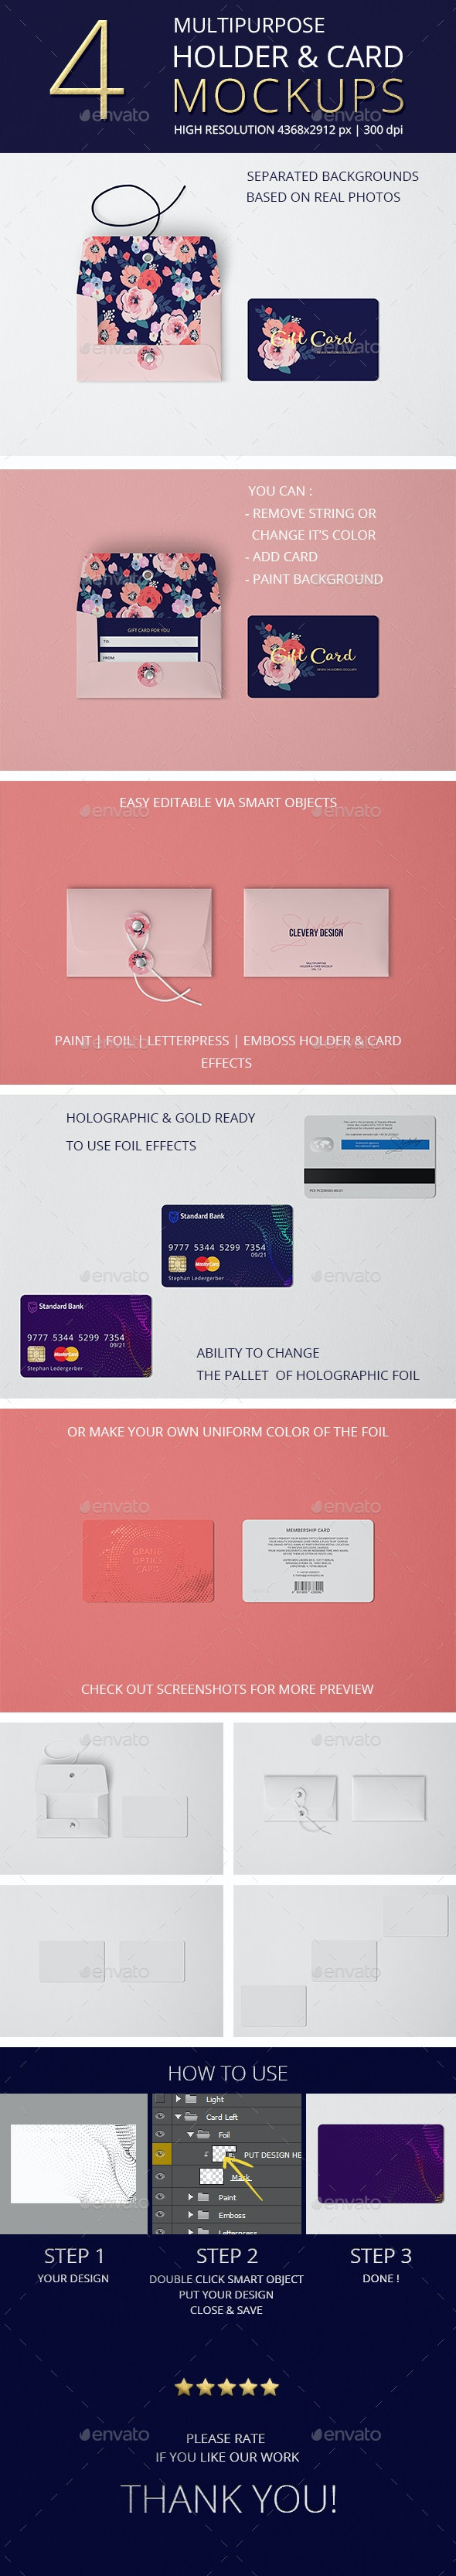 Multipurpose Holder & Card Mockup Vol 7.0 - Miscellaneous Print